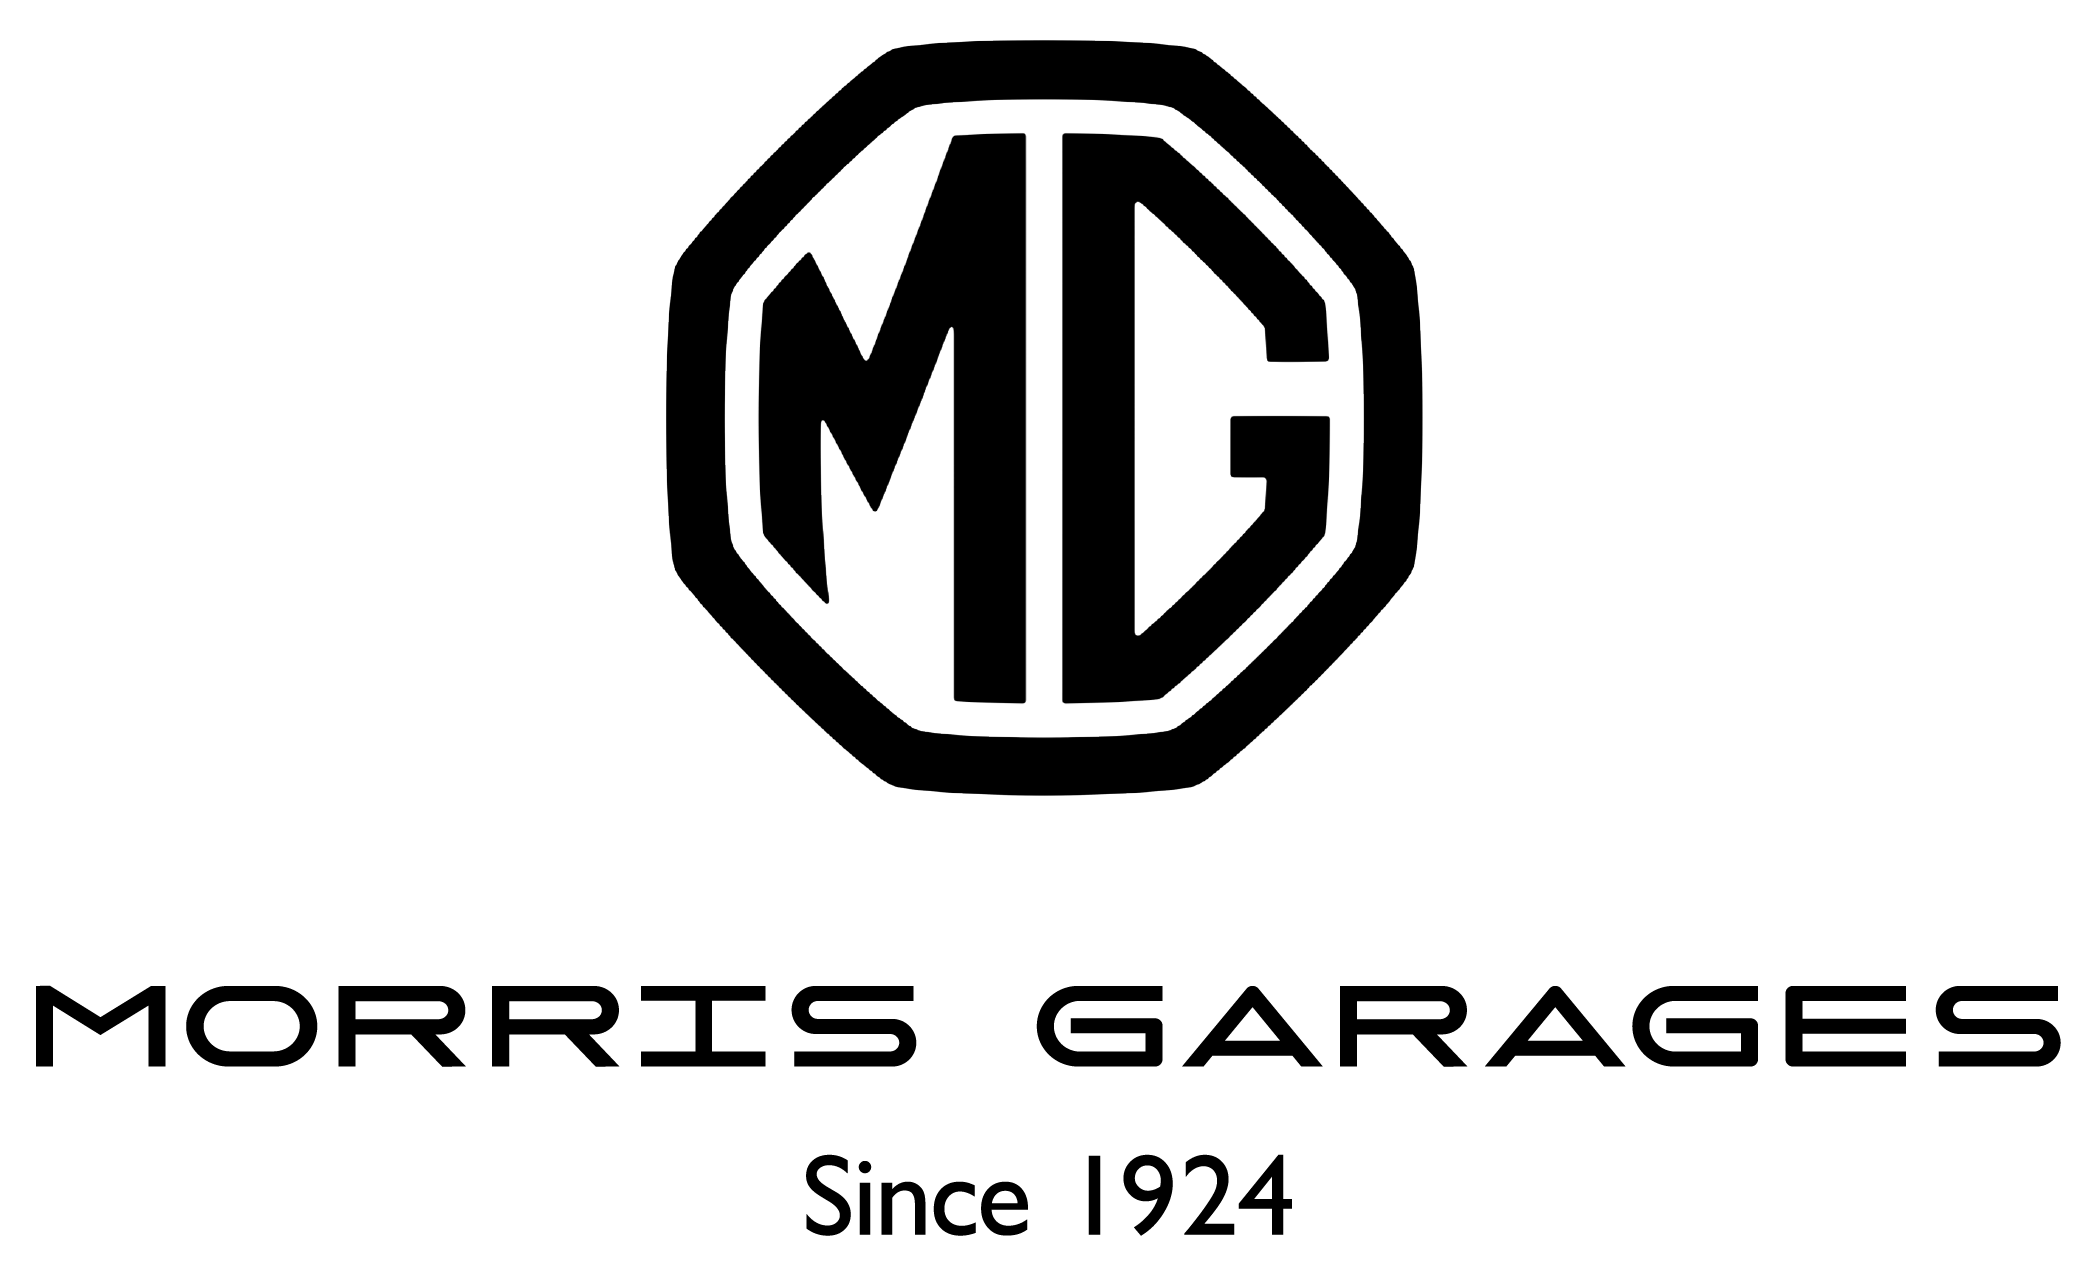 https://assets.roar.media/assets/JRy7rxB6THufKxtB_MG_Logo-02.png